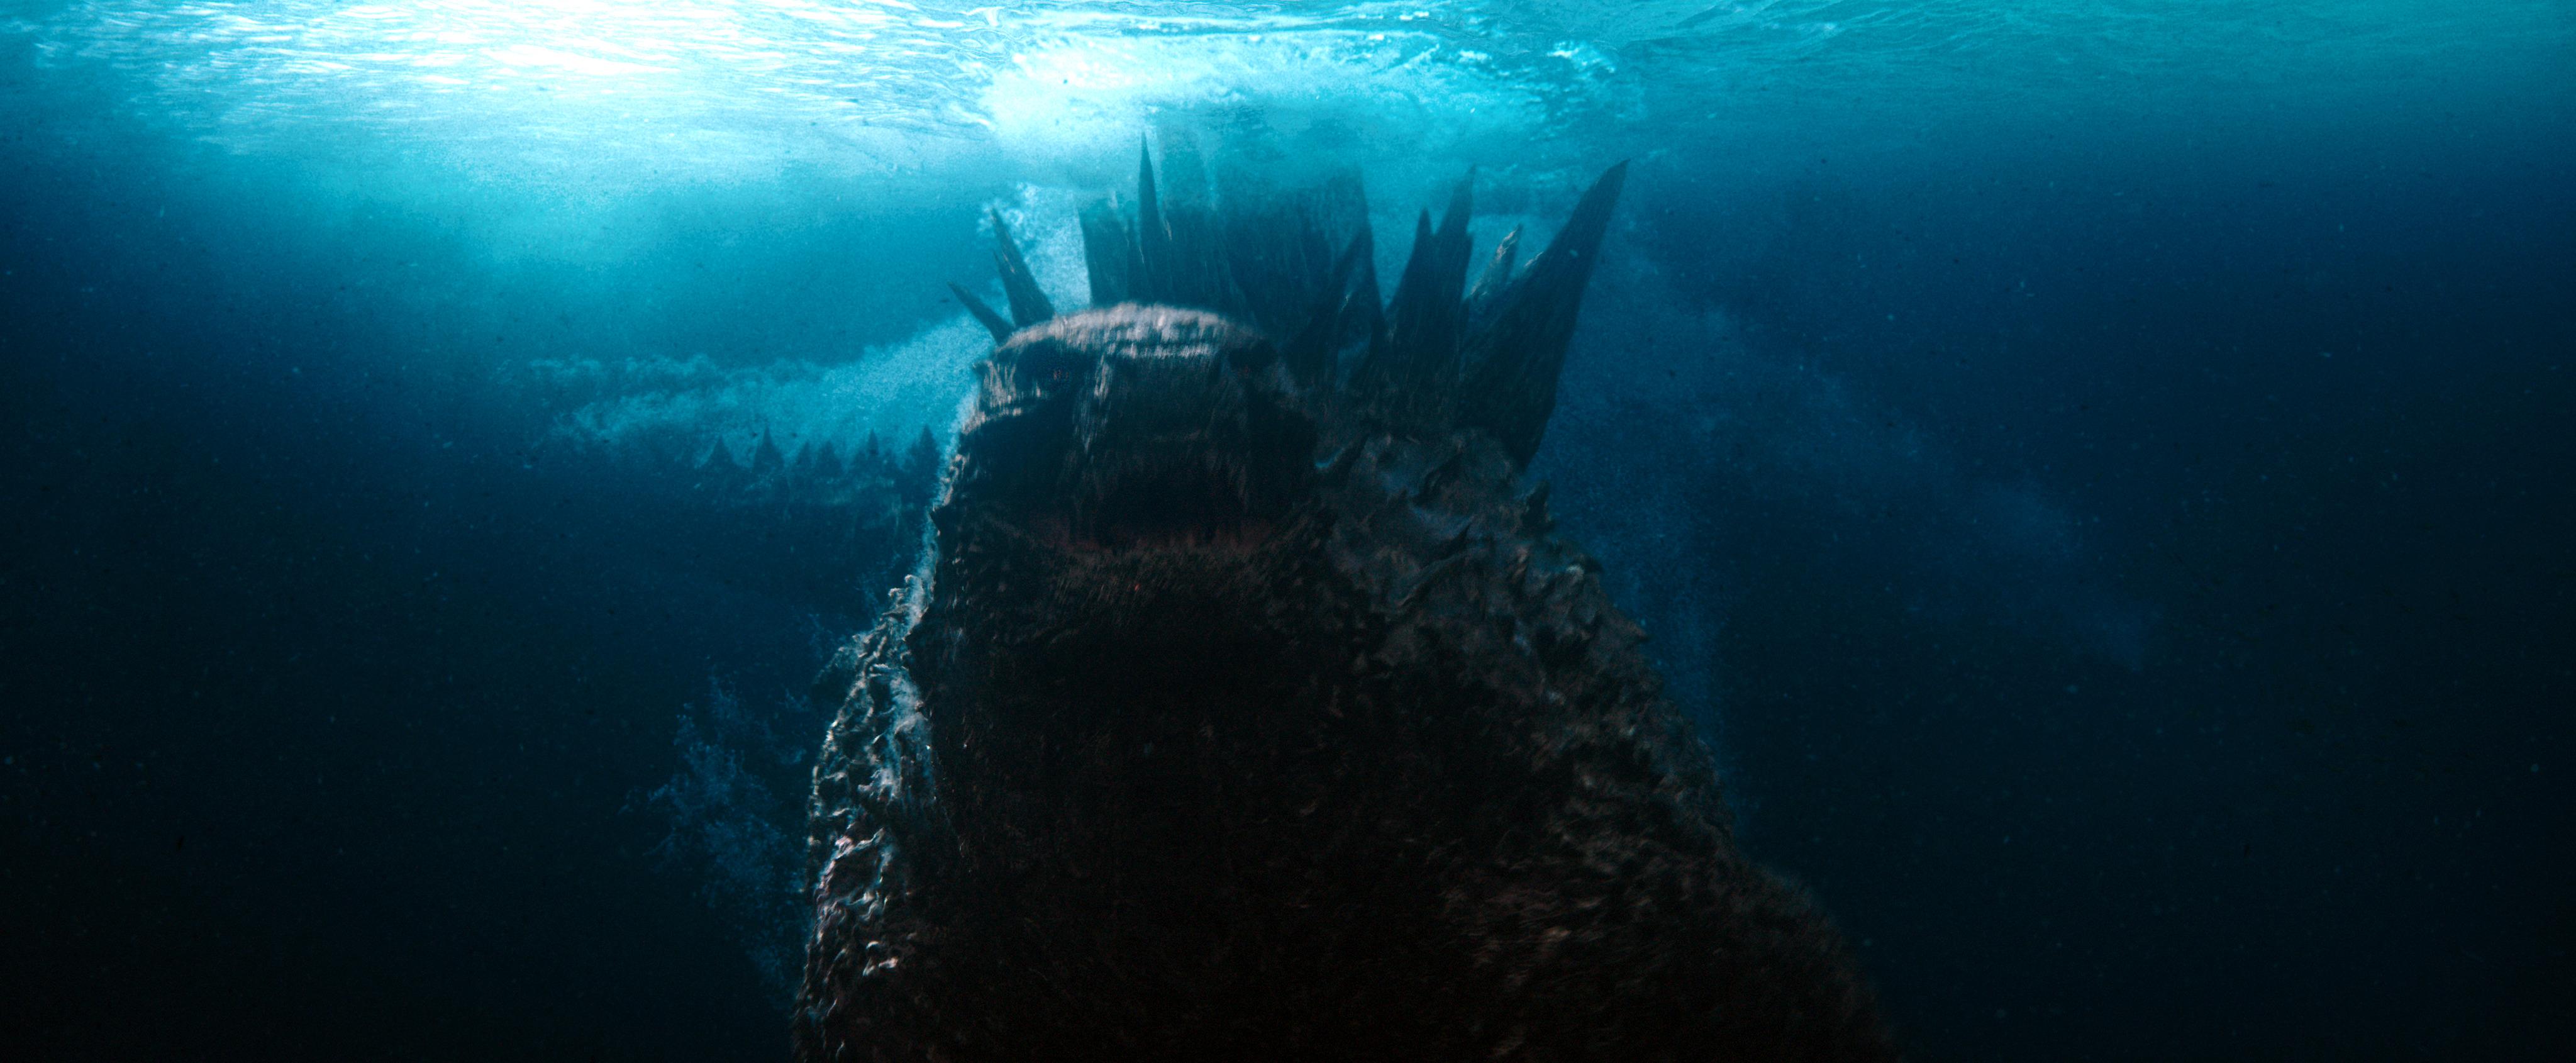 Godzilla, lurking underwater in Godzilla vs. Kong